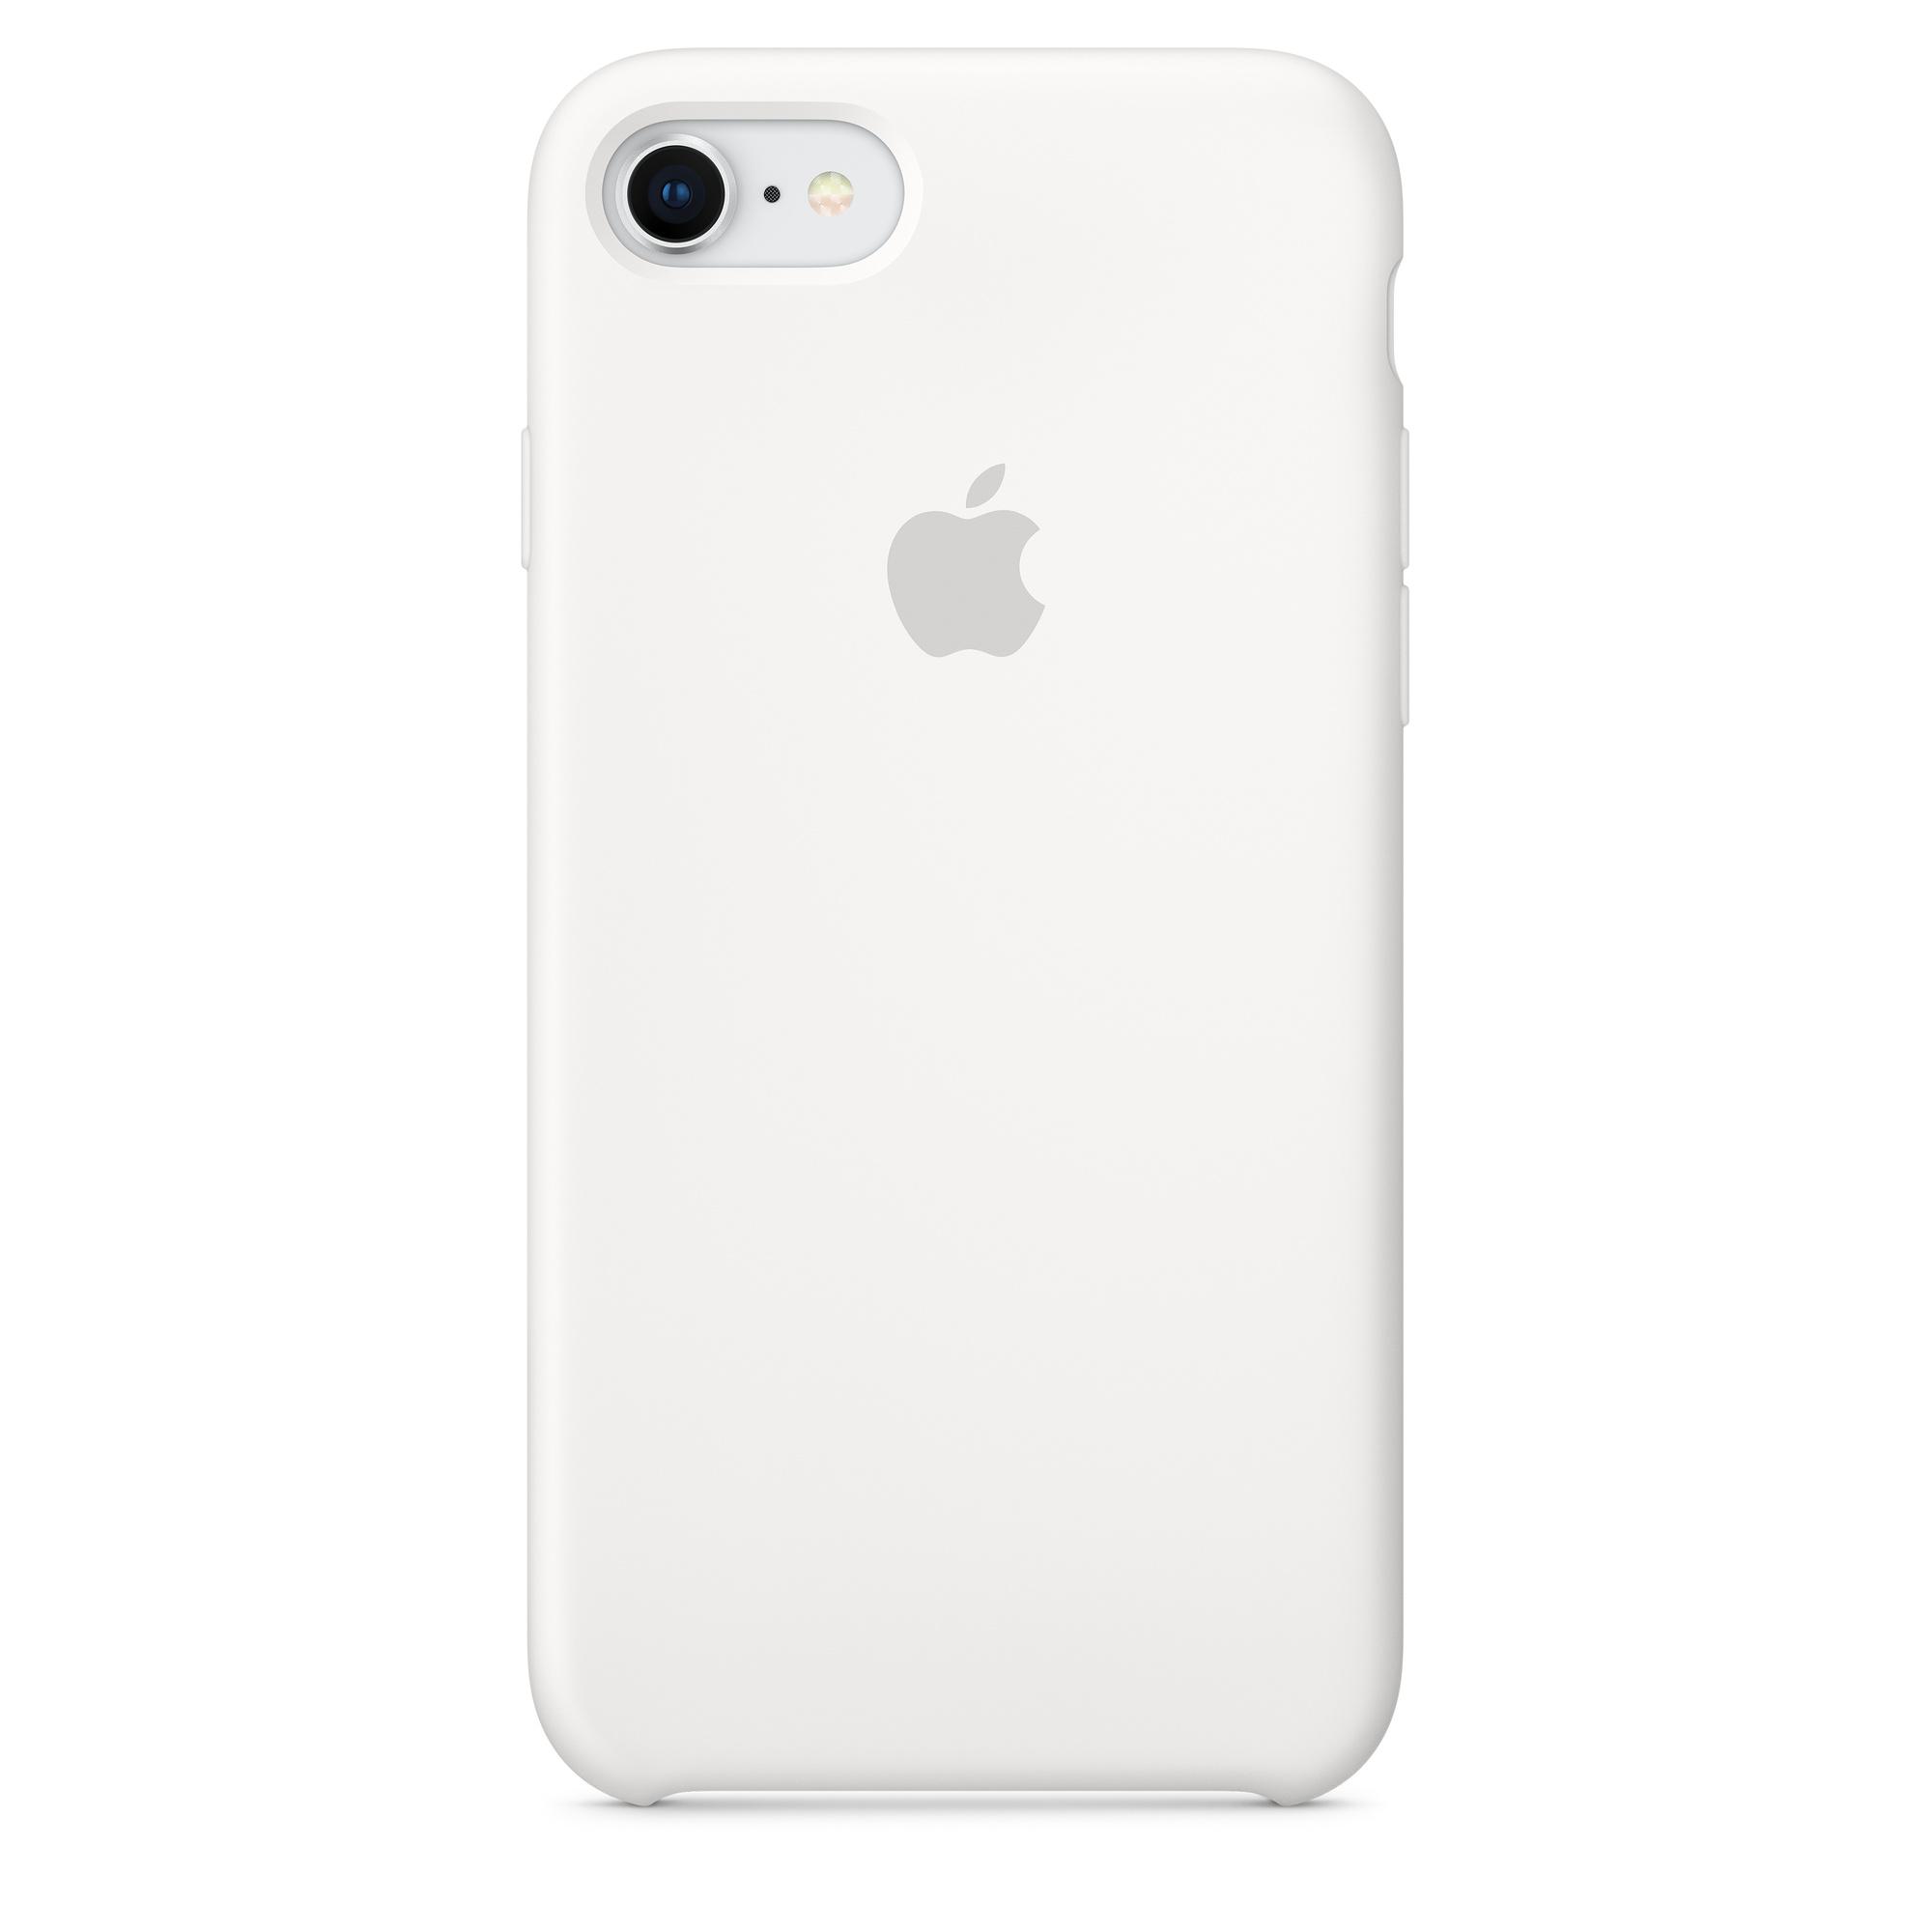 apple 7 iphone case